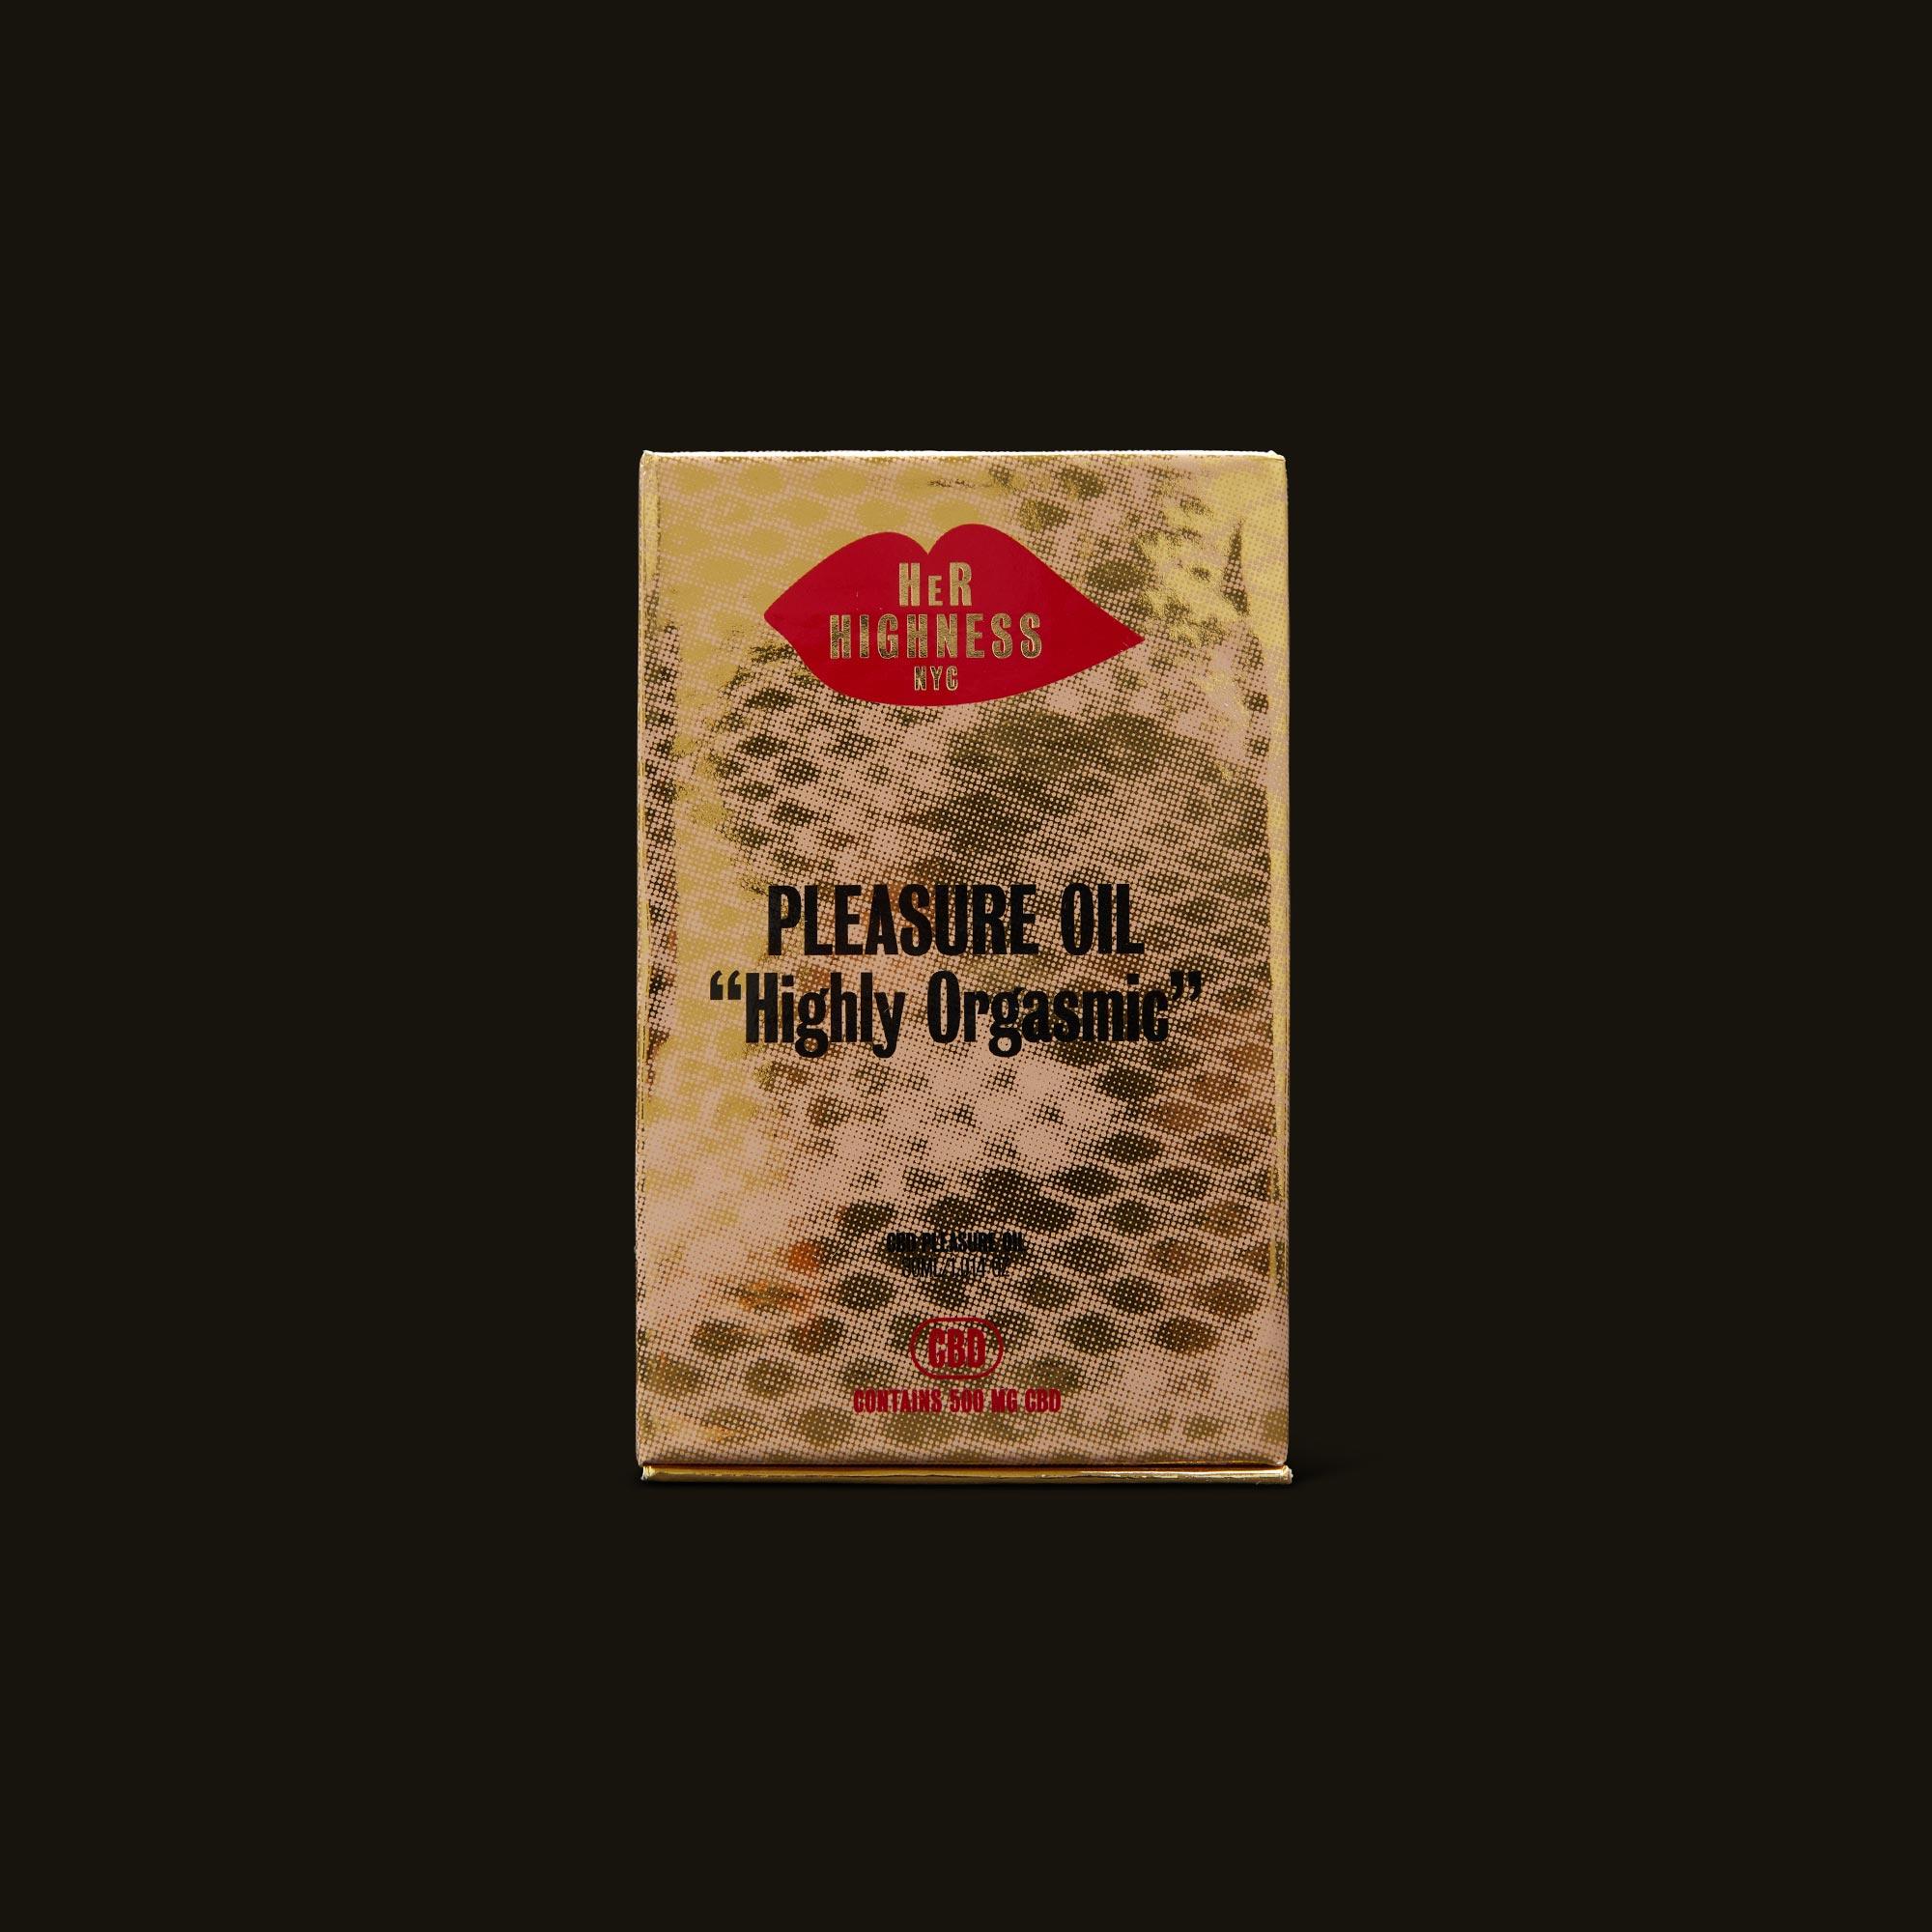 Her Highness CBD Pleasure Oil Front of Box